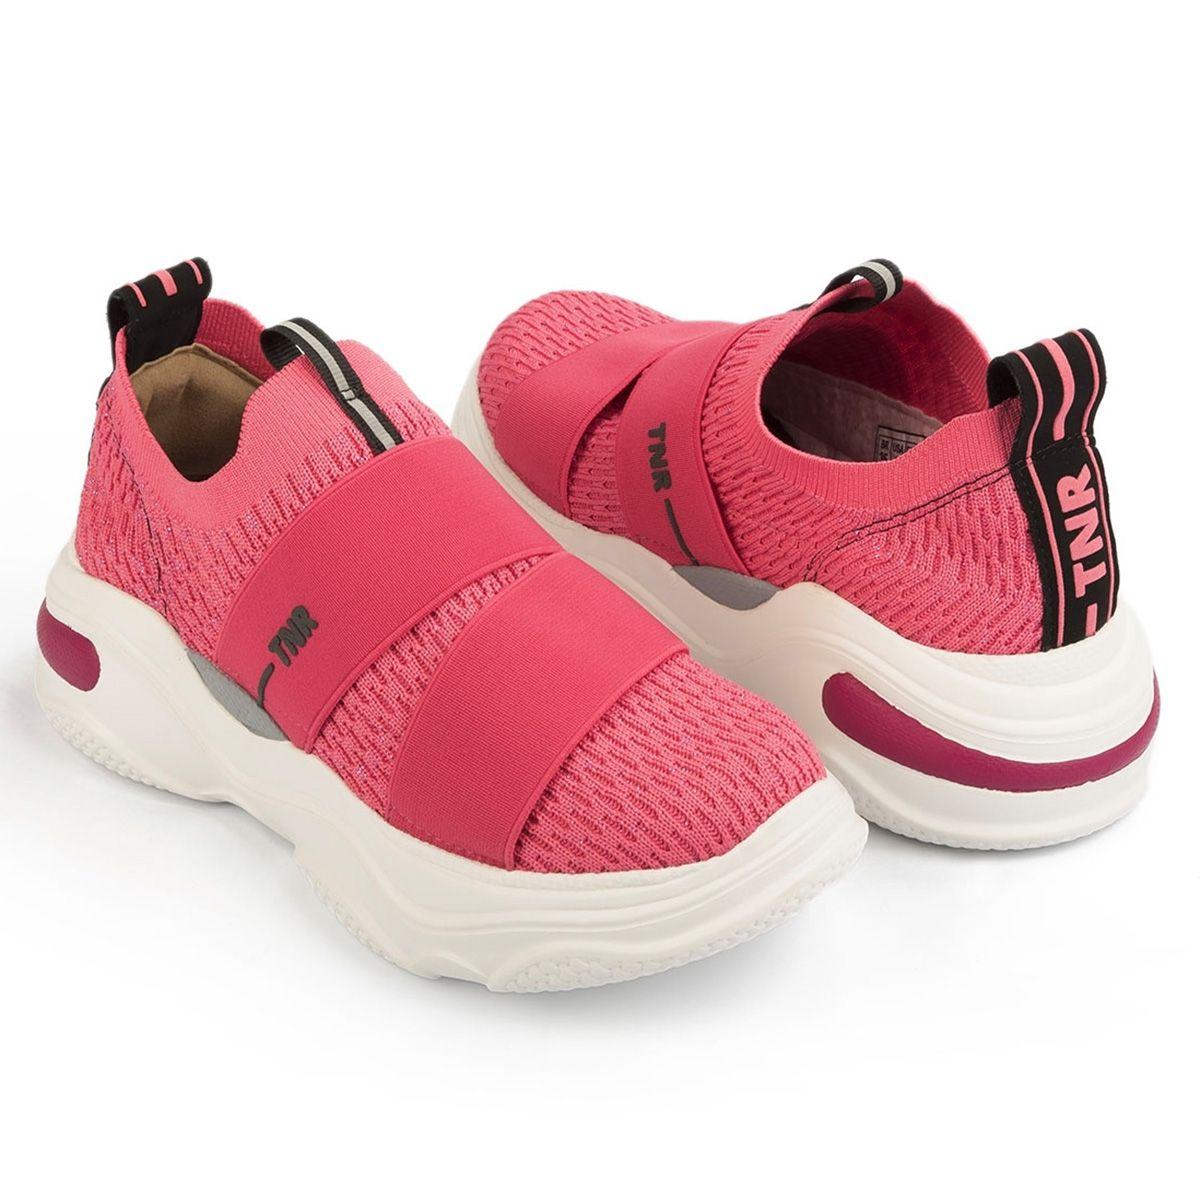 Tenis Tanara Tratorado Rosa Dad Sneaker T4182